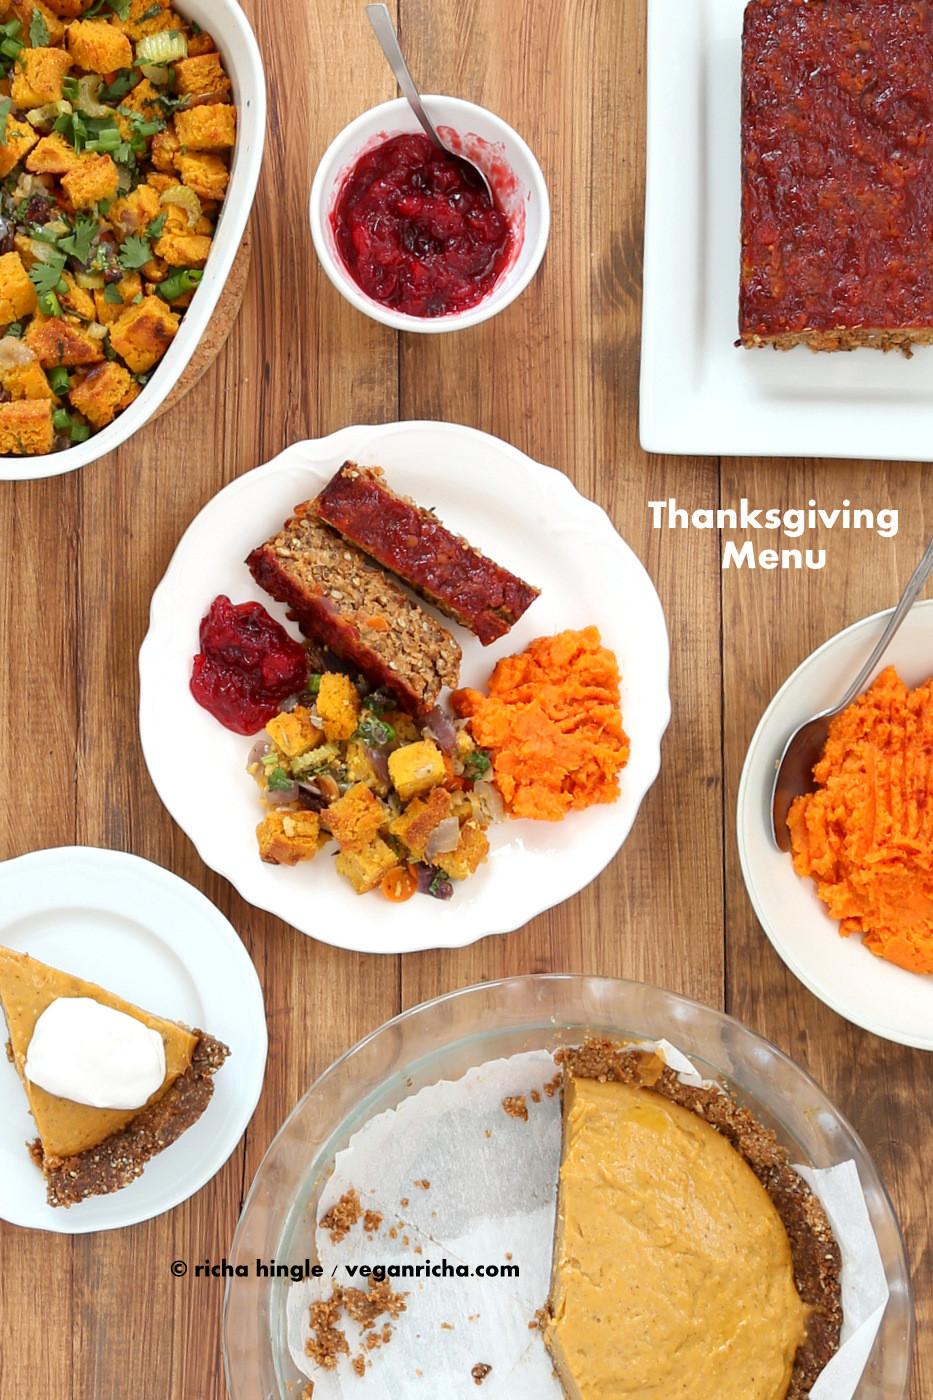 Vegan Thanksgiving Gravy  80 Vegan Thanksgiving Recipes 2014 Vegan Richa